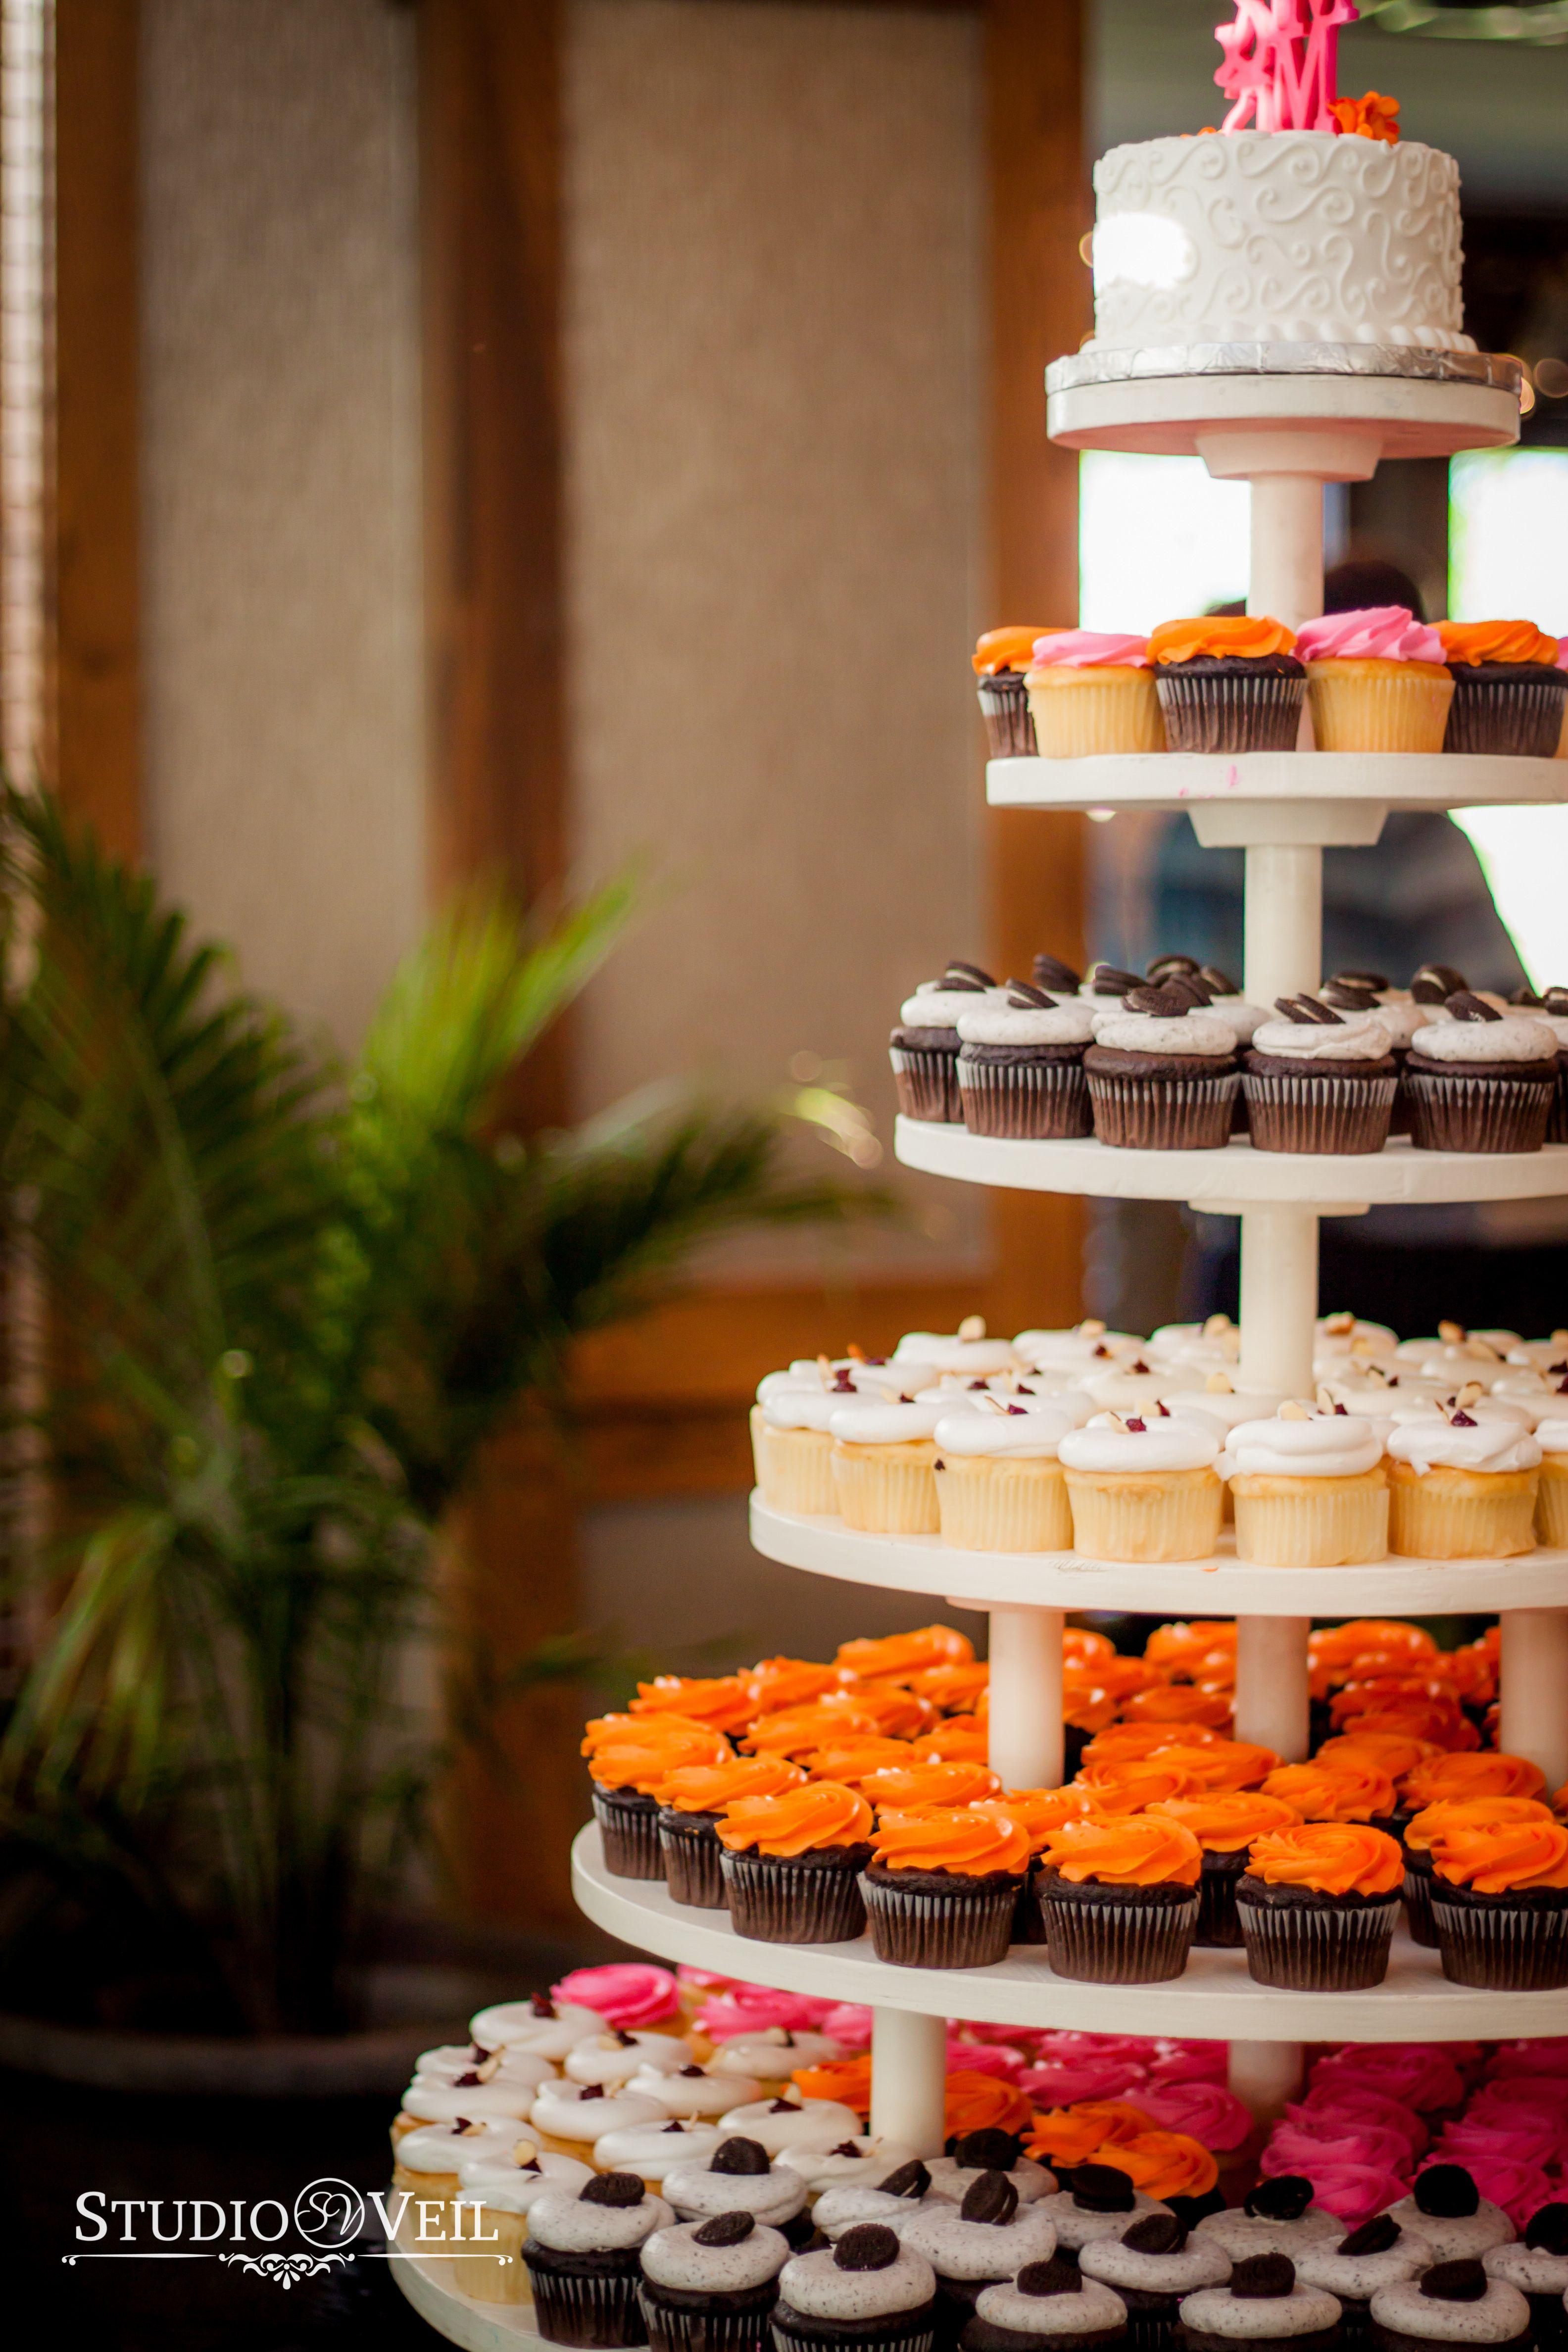 Wedding Cupcakes Reception Dorothyannbaker Woodbury Mn Http